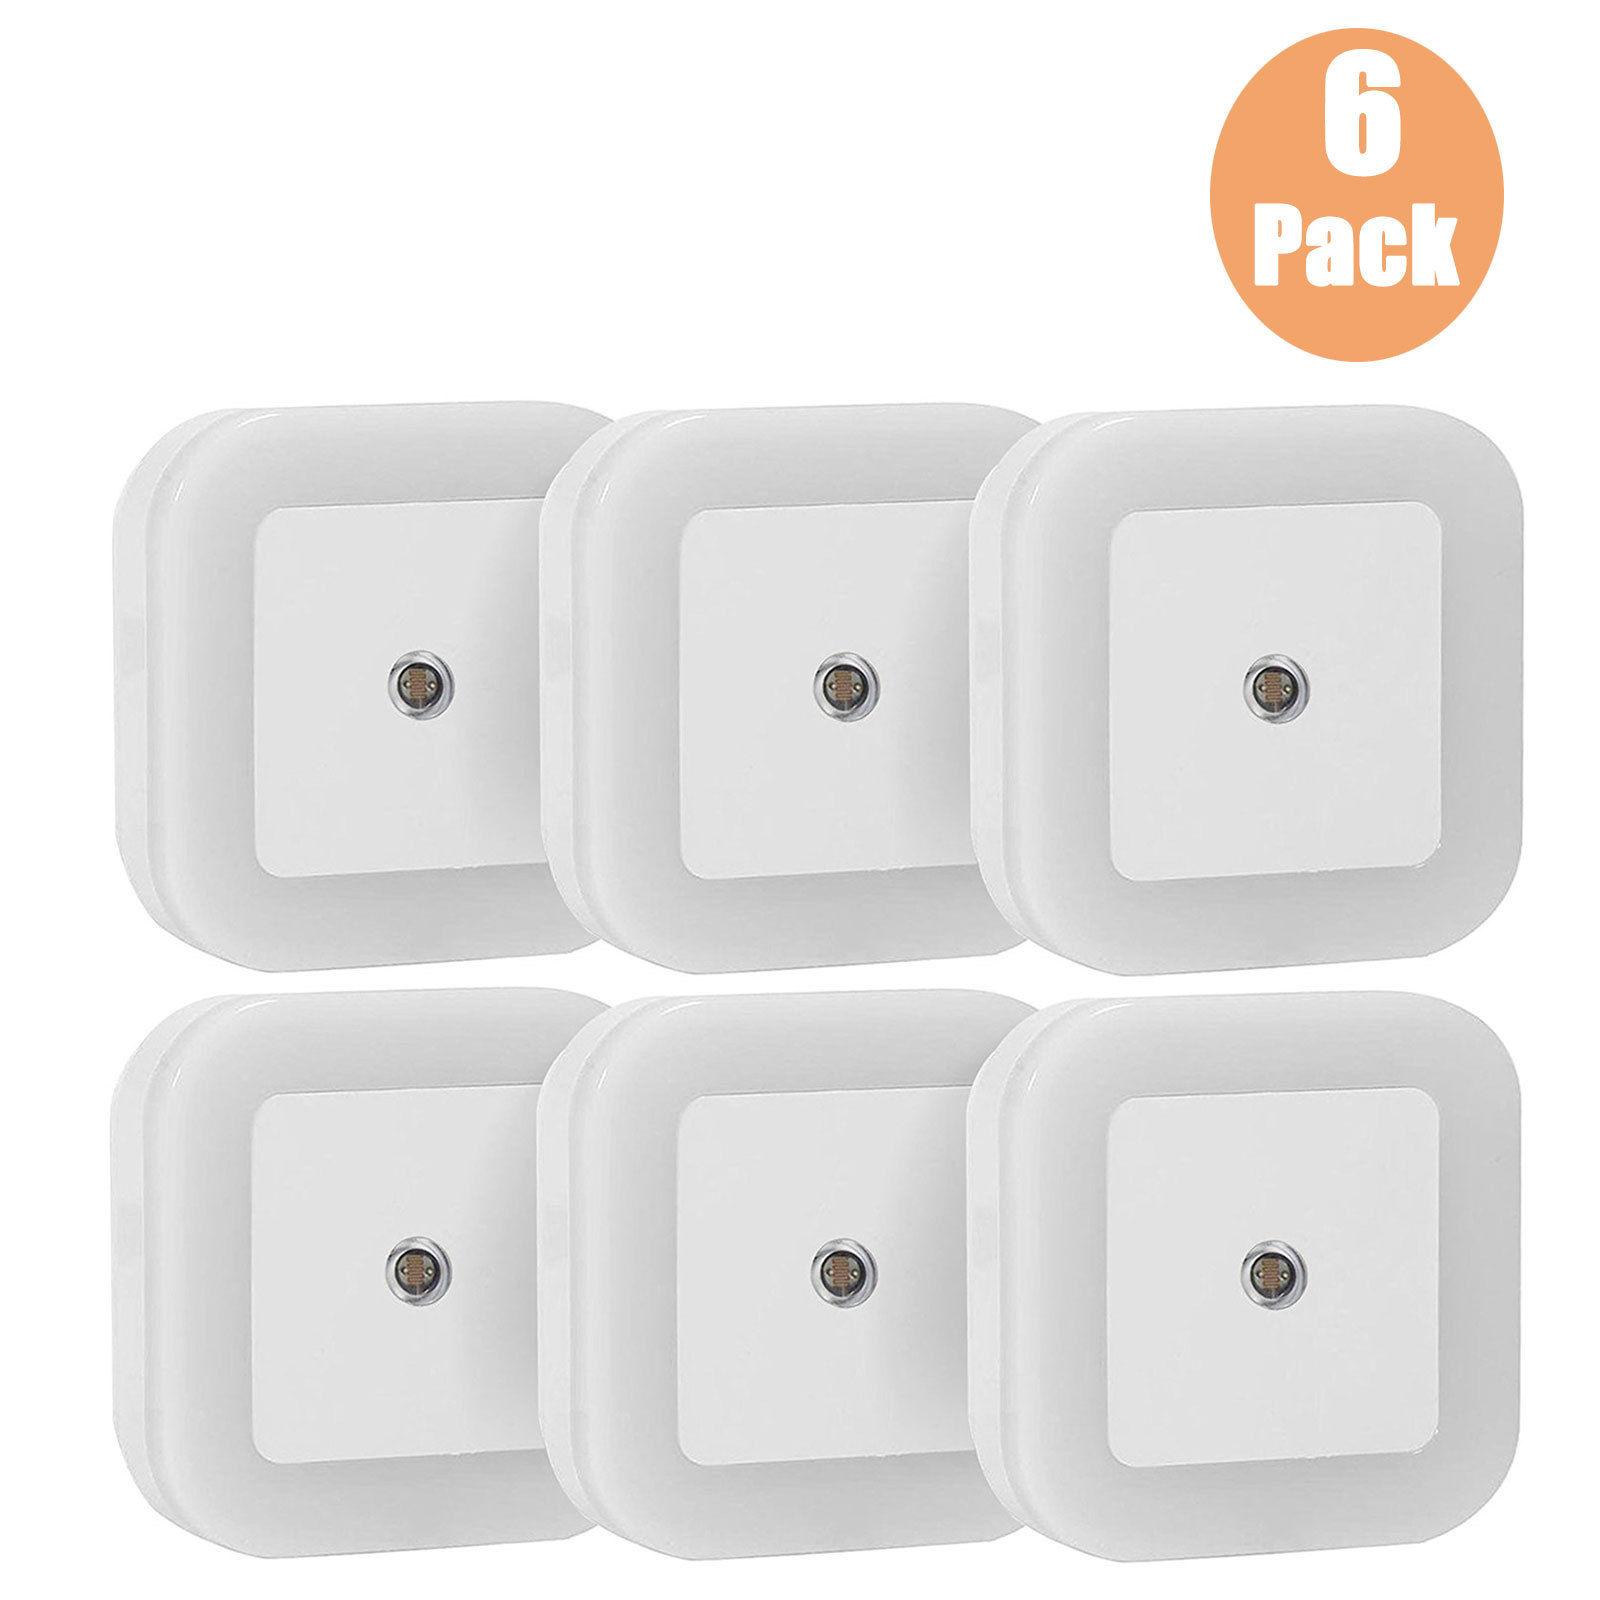 0-5W-Plug-in-Auto-Sensor-Control-LED-Night-Light-Lamp-for-Bedroom-Hallway-Bath thumbnail 14